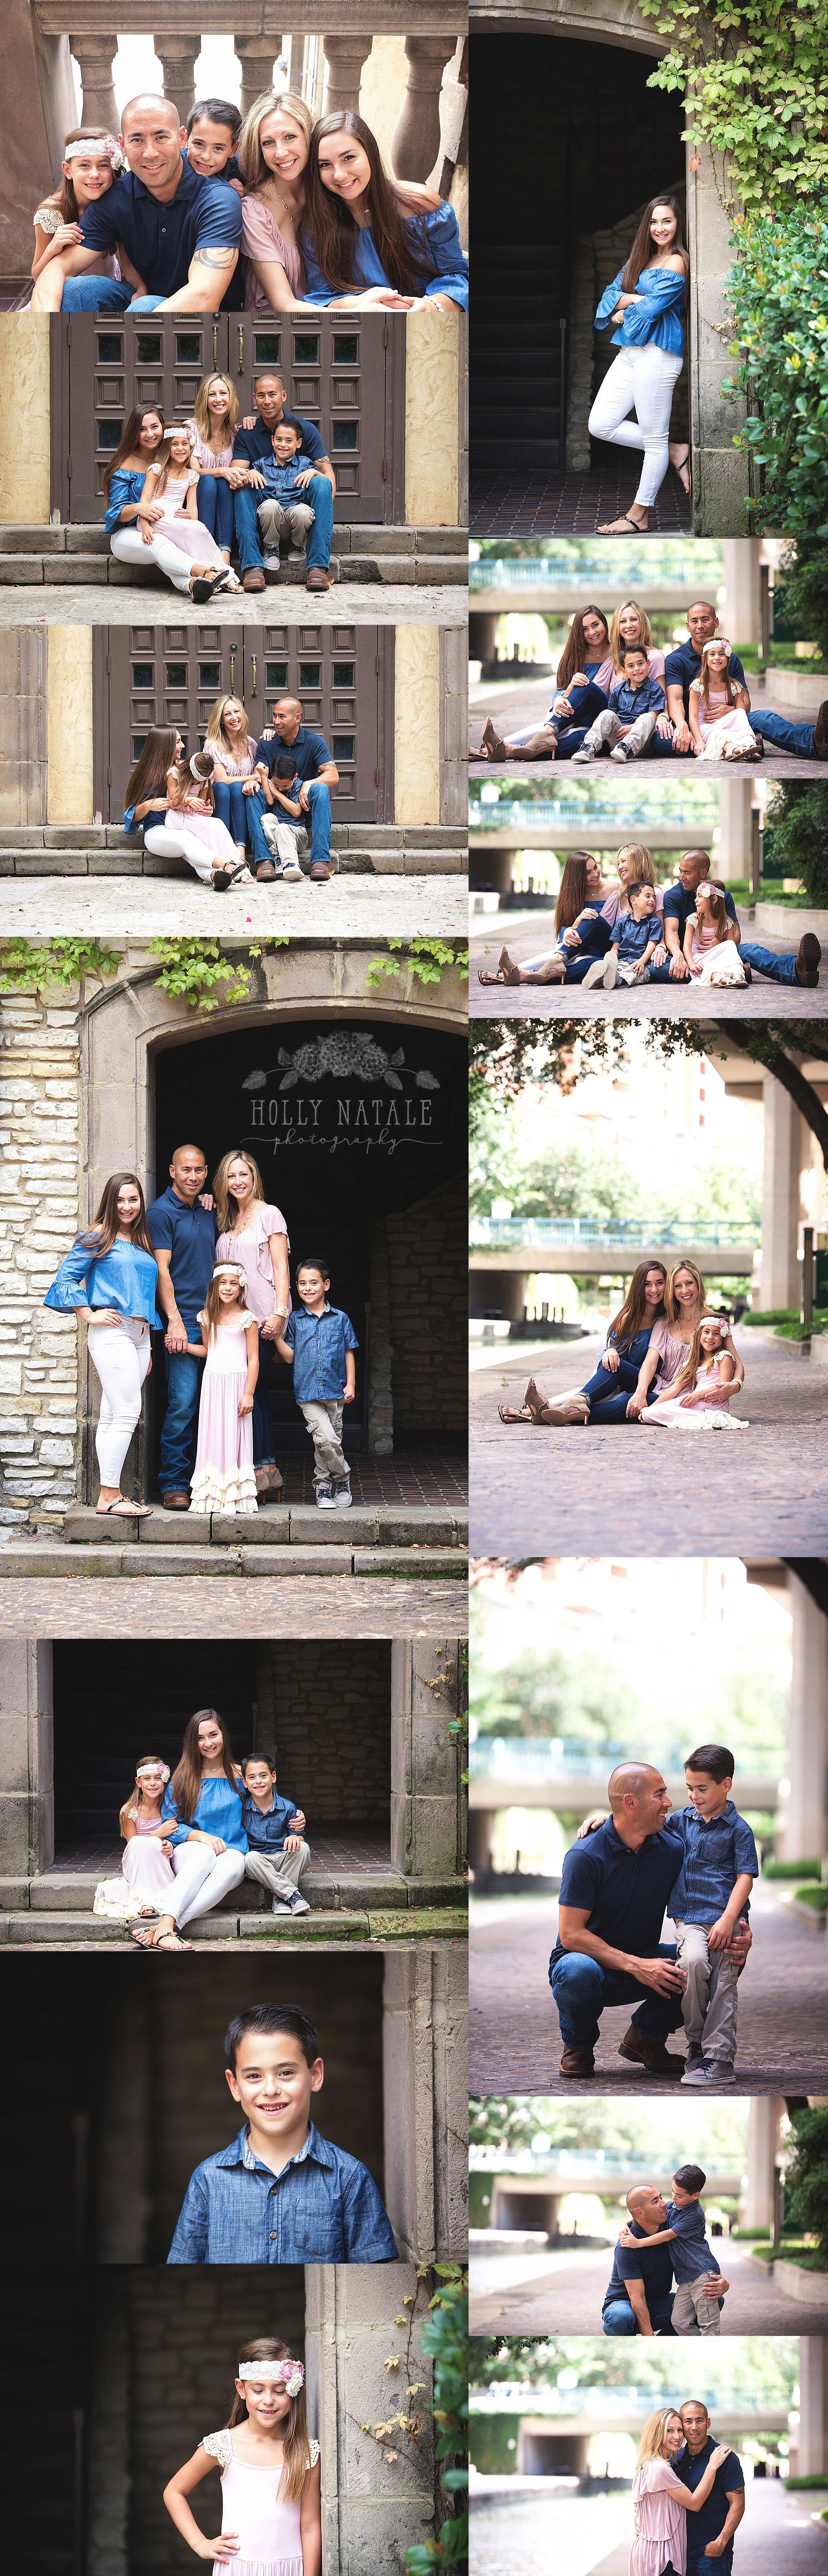 Family photography family photo session family of 5 for Urban family photo ideas